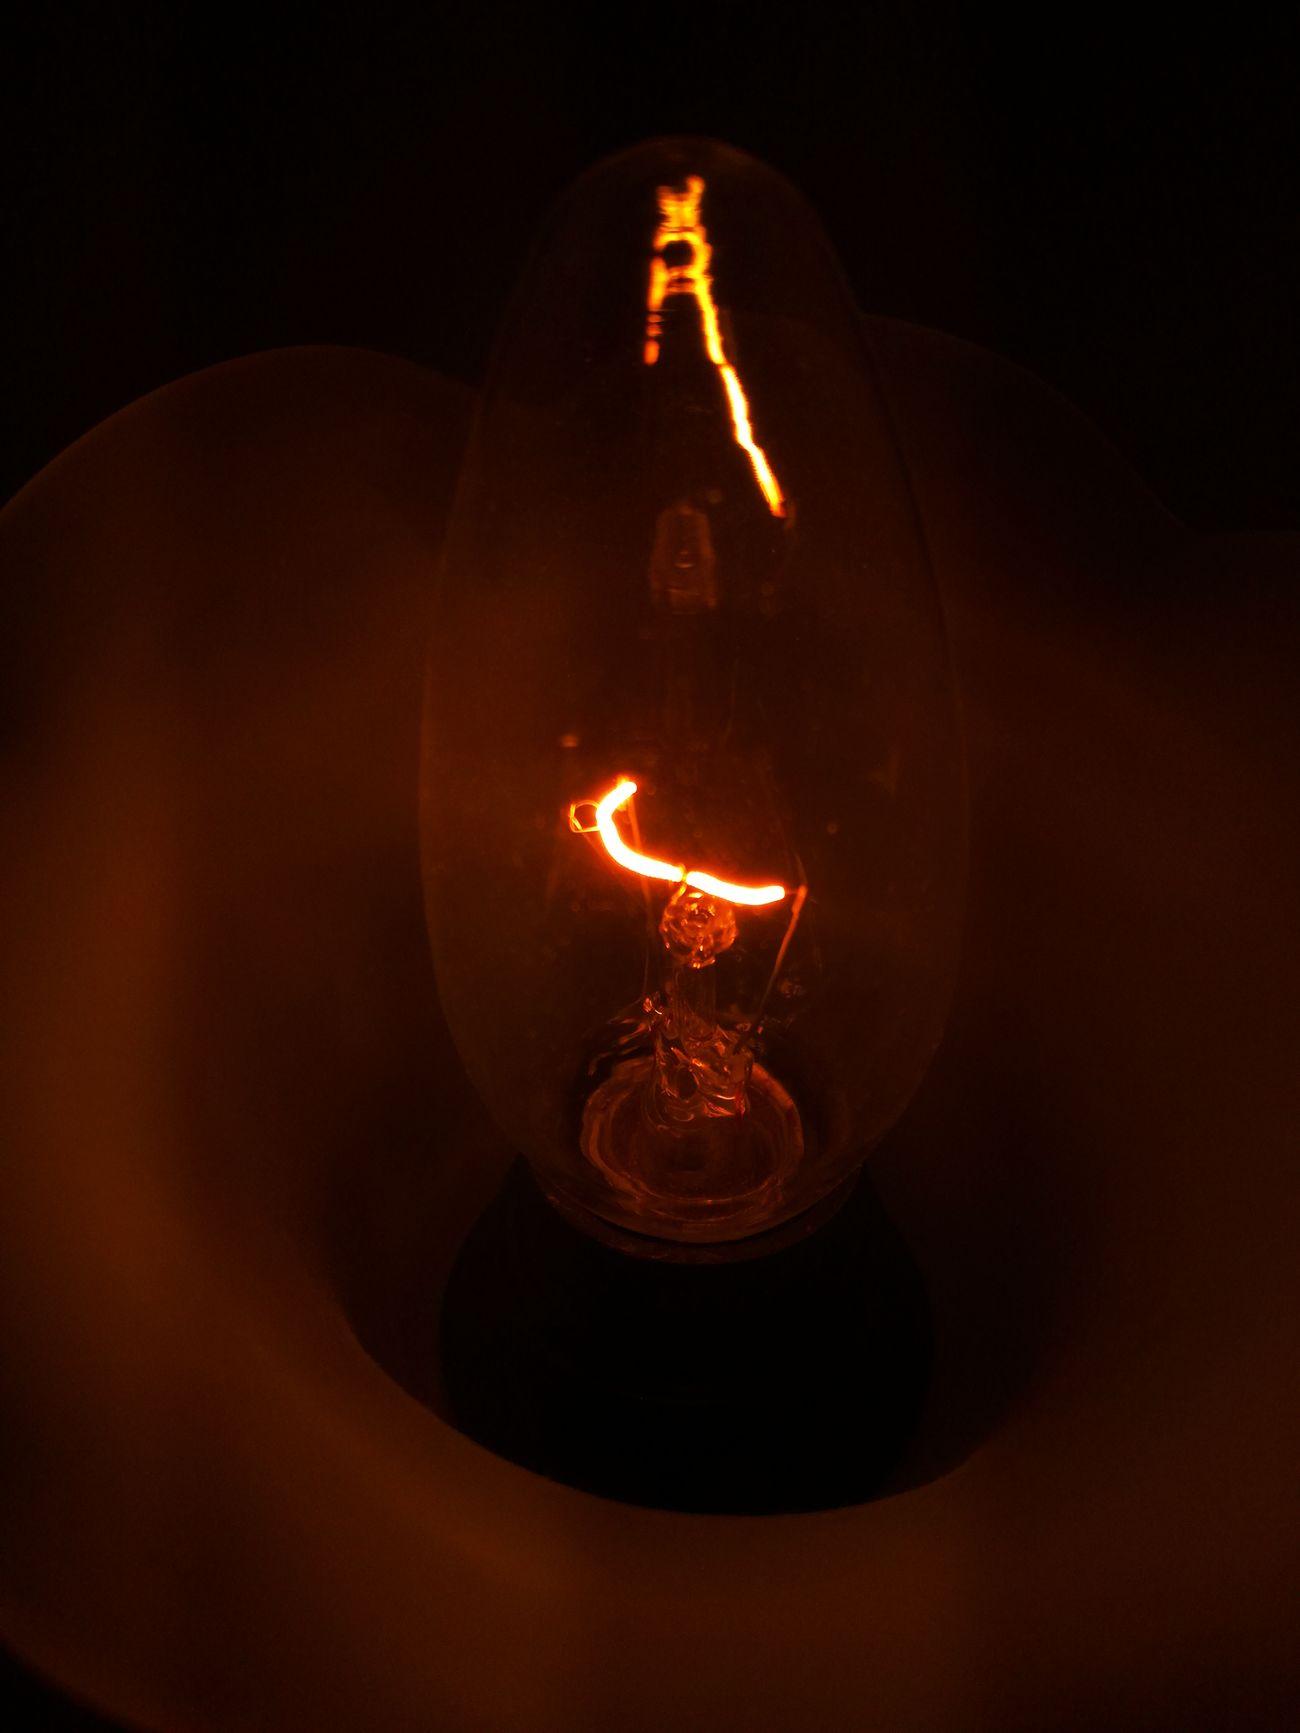 Electricity  Heat - Temperature Illuminated Light Bulb Filament Night Black Background No People Close-up Flame Lighting Equipment